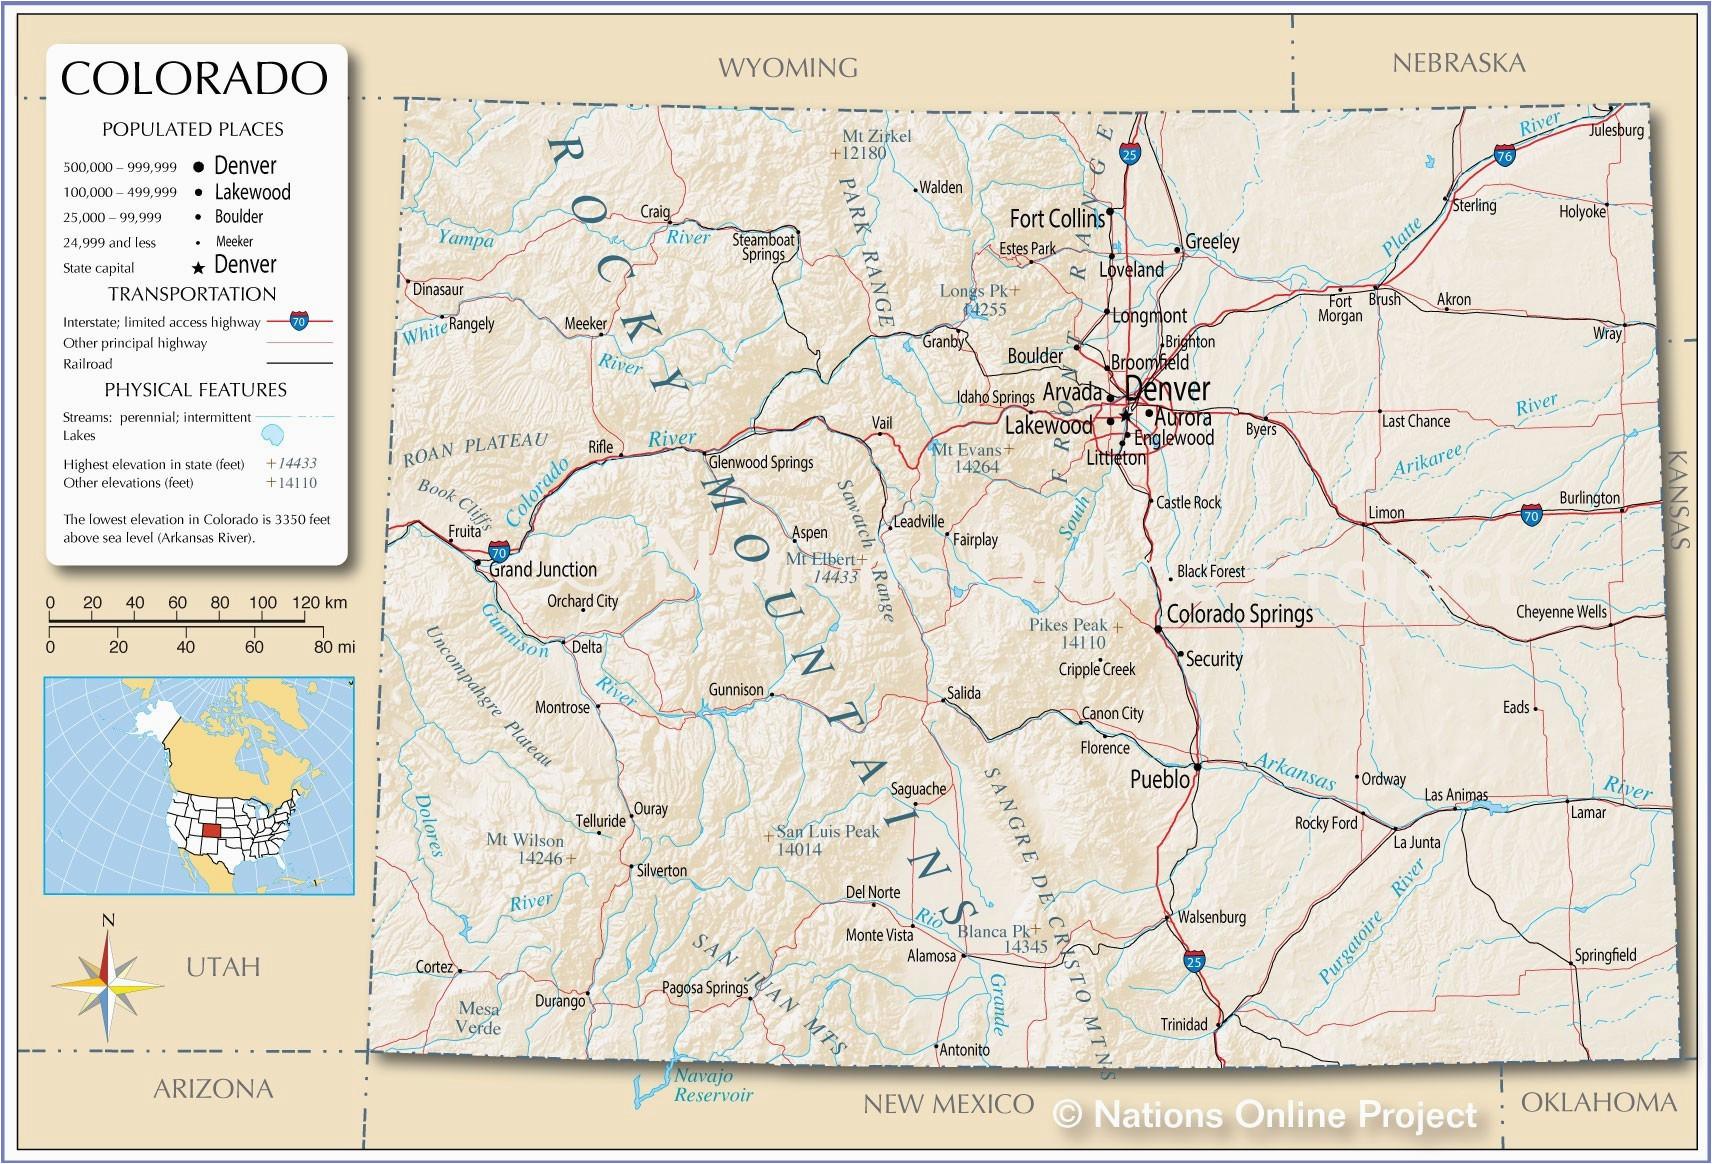 colorado lakes map awesome colorado highway map etiforum ny county map